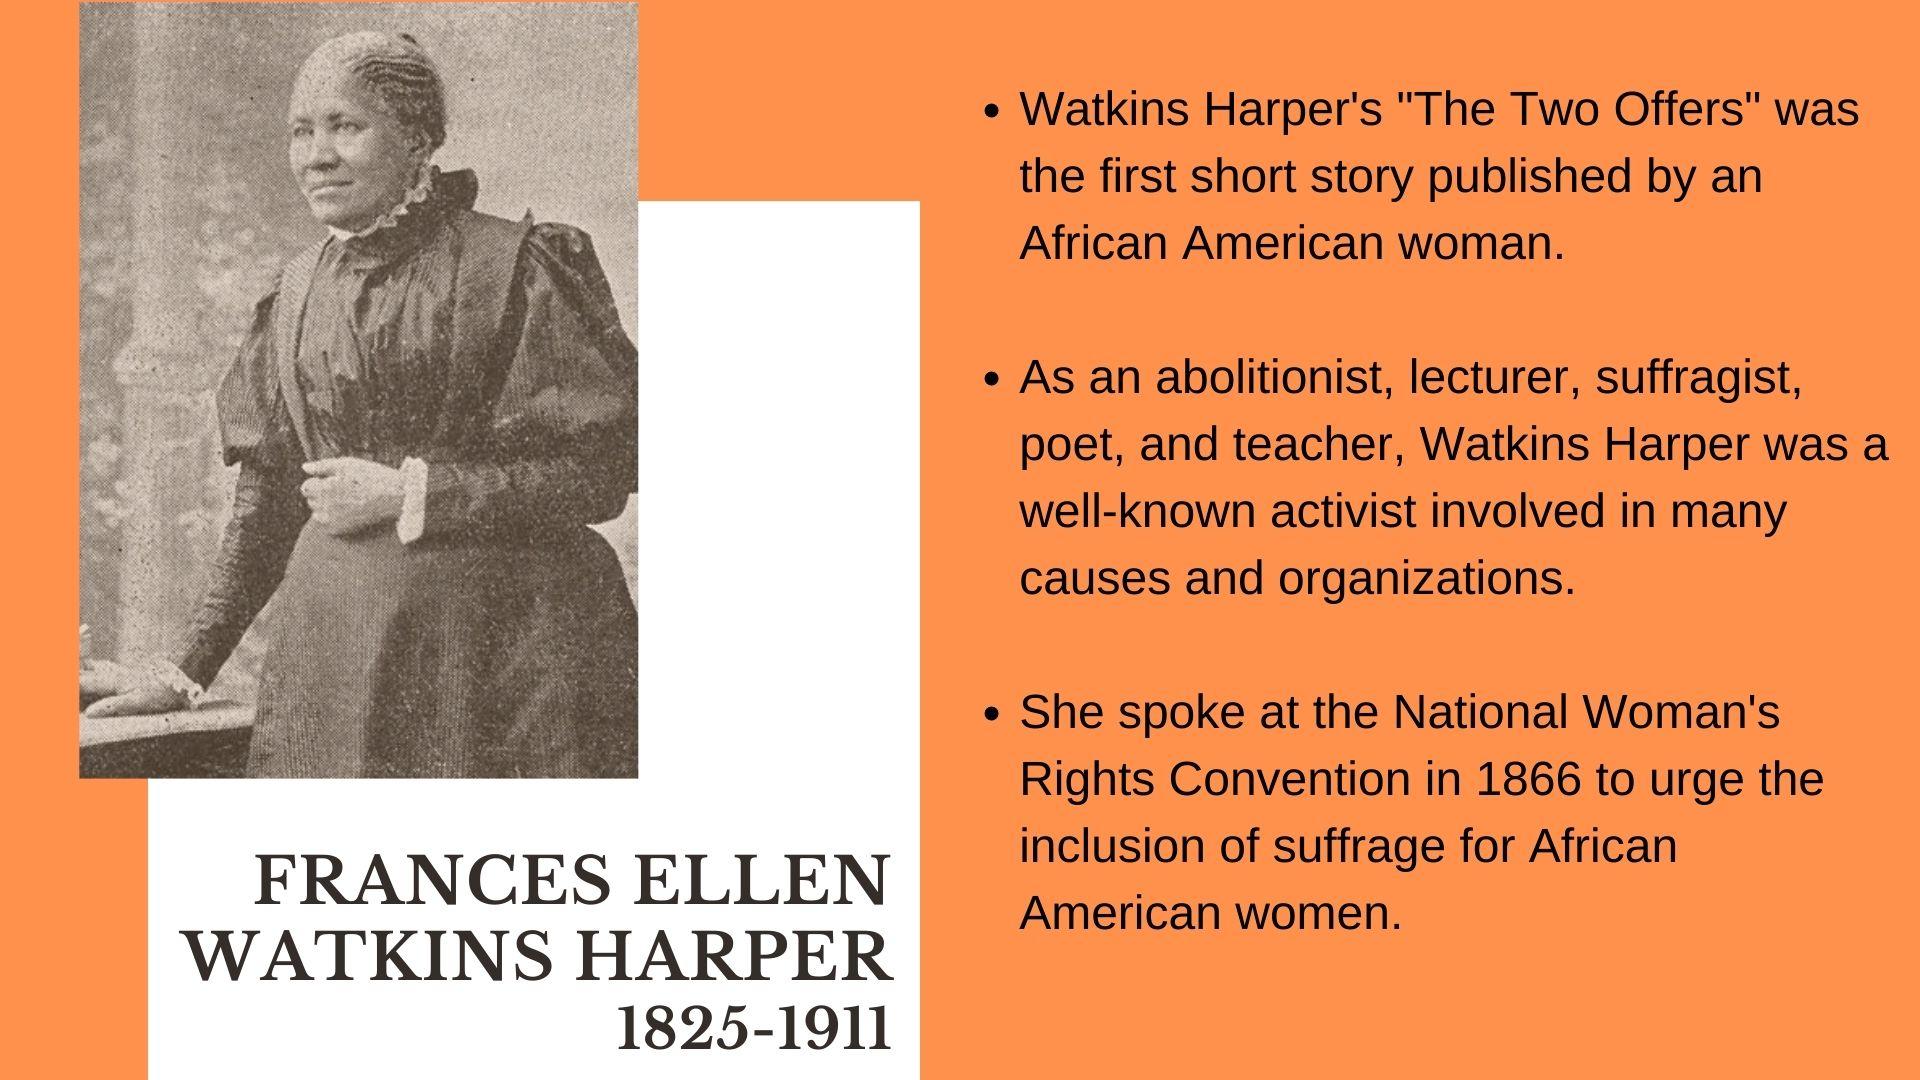 Frances Ellen Watkins Harper  1825-1911 Watkins Harper's